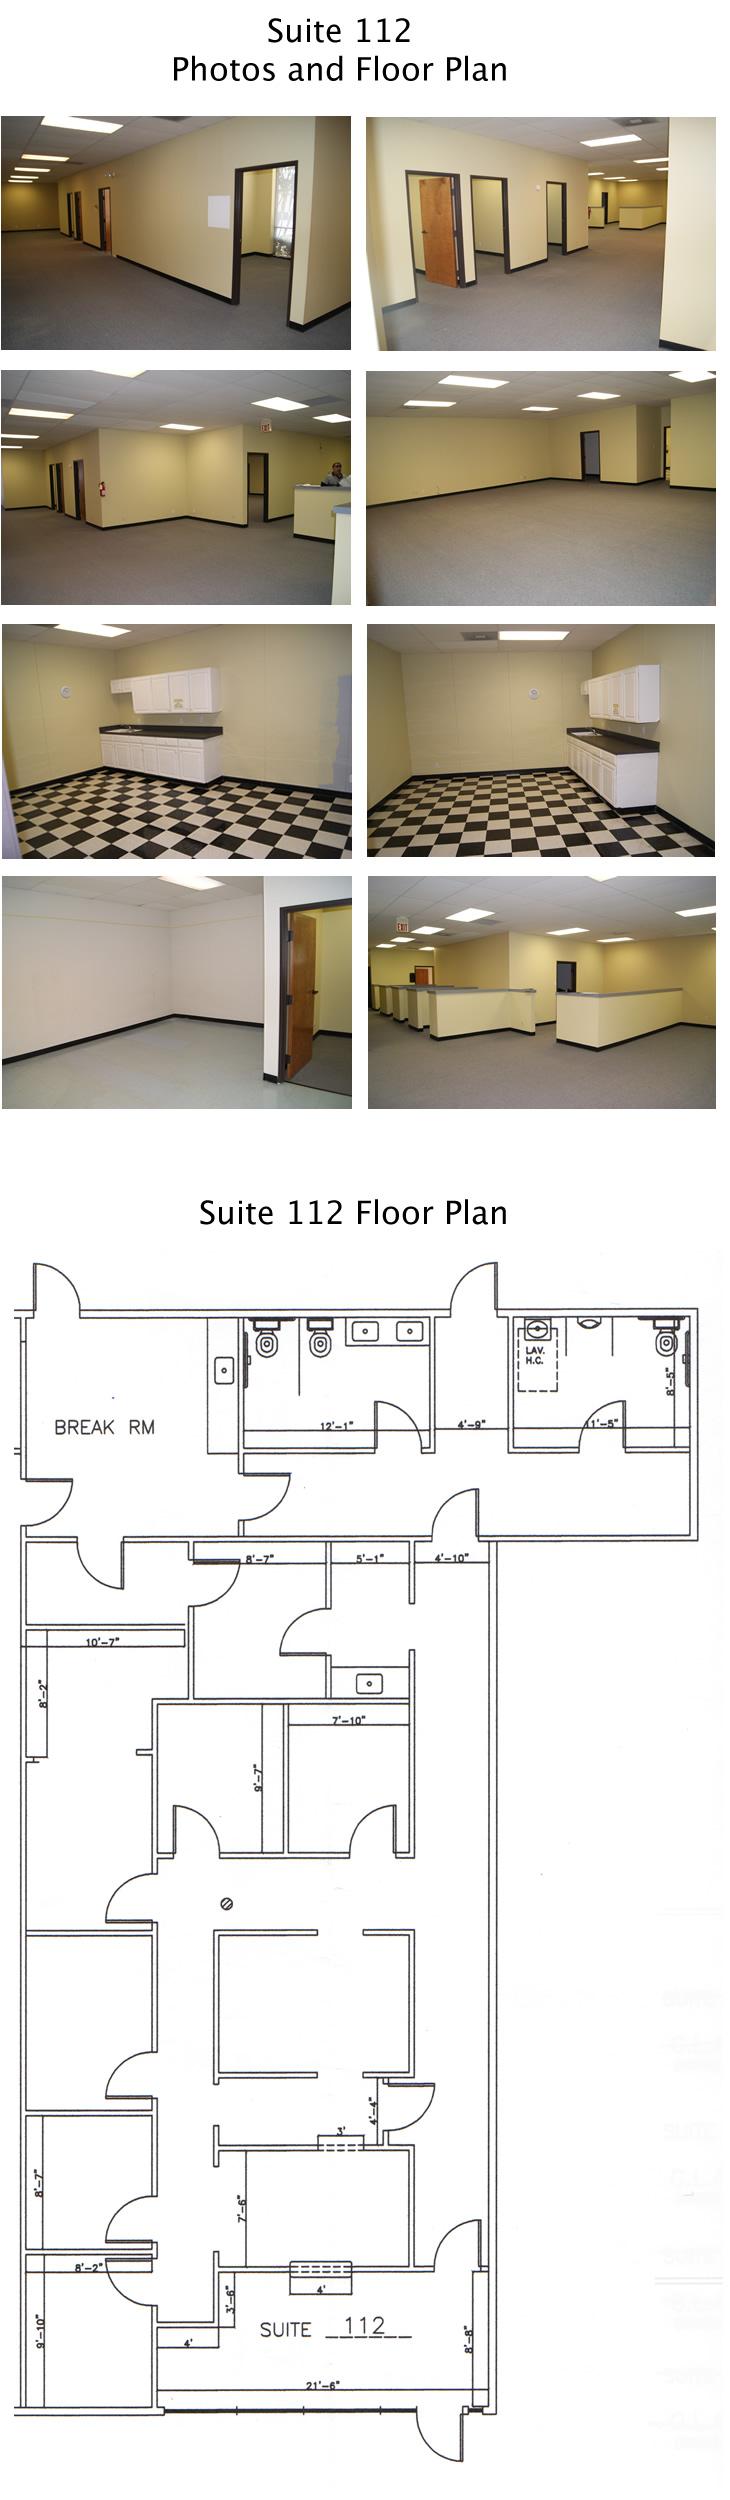 Sunrise Office Center - Suite 122/Floor plan